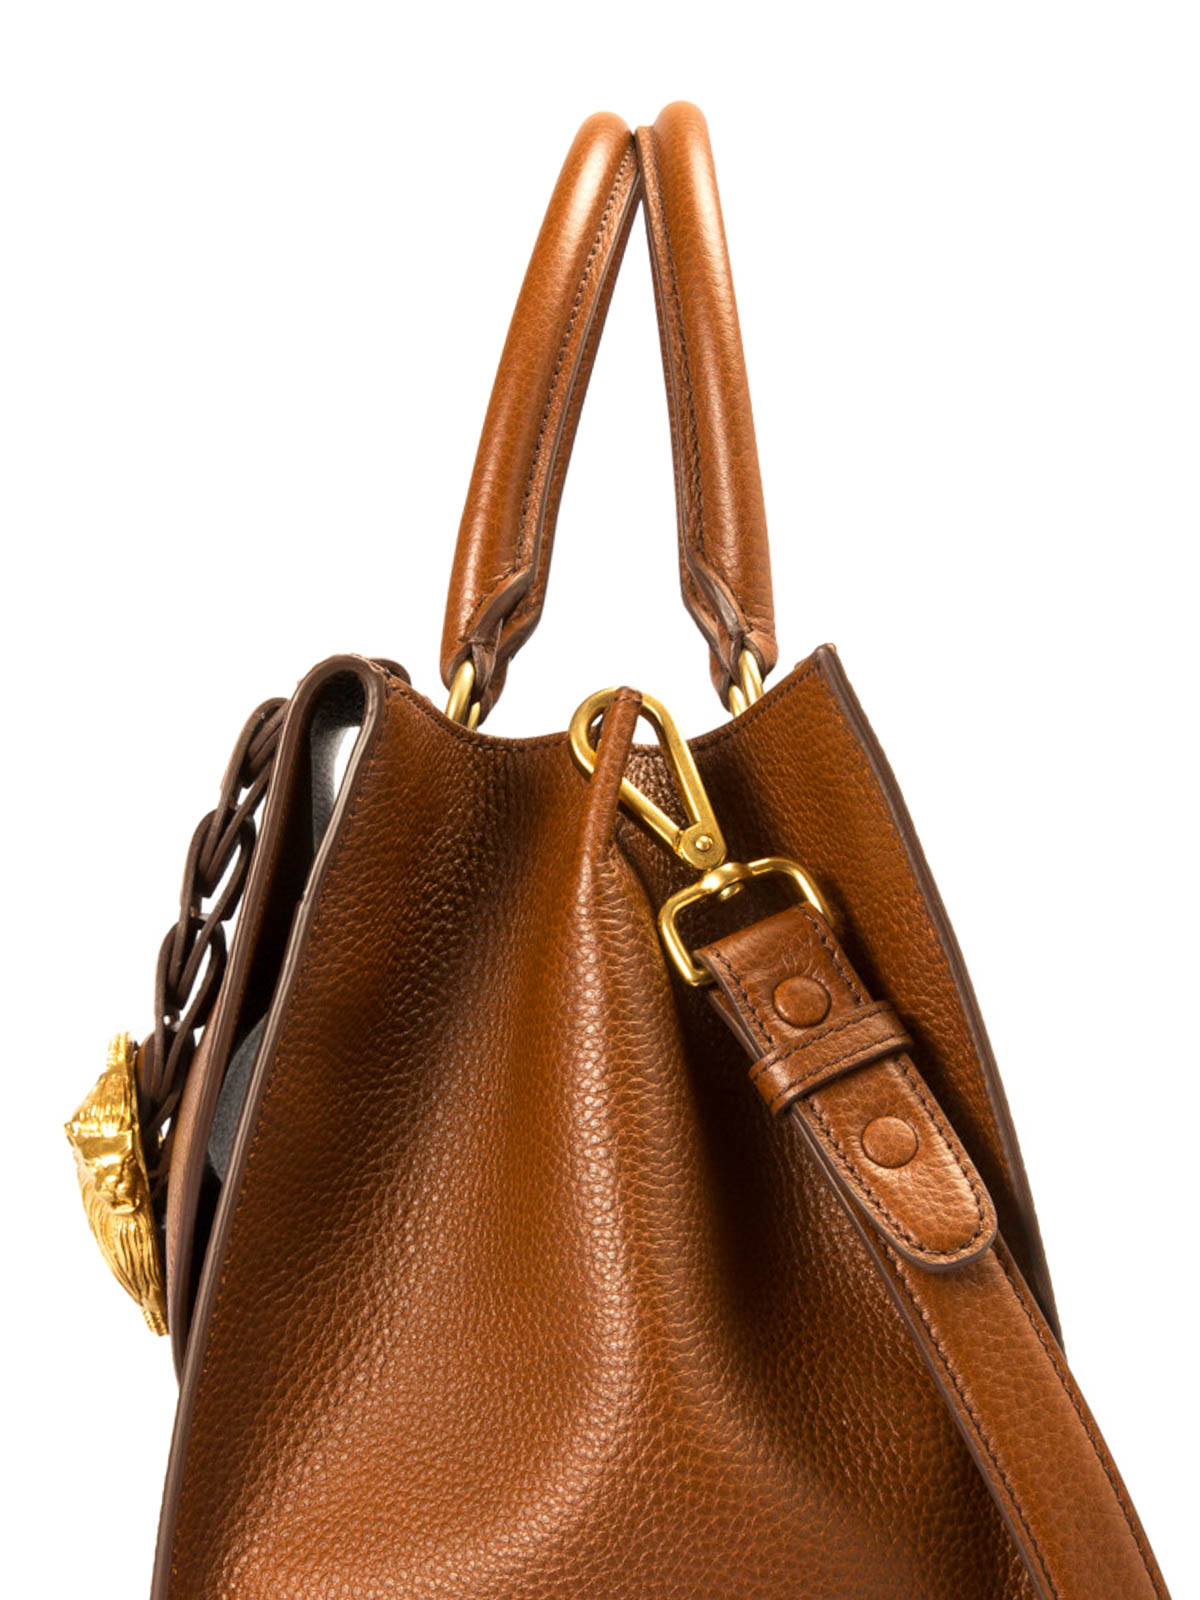 Roberto Cavalli Hammered leather bowling bag SPNwERC